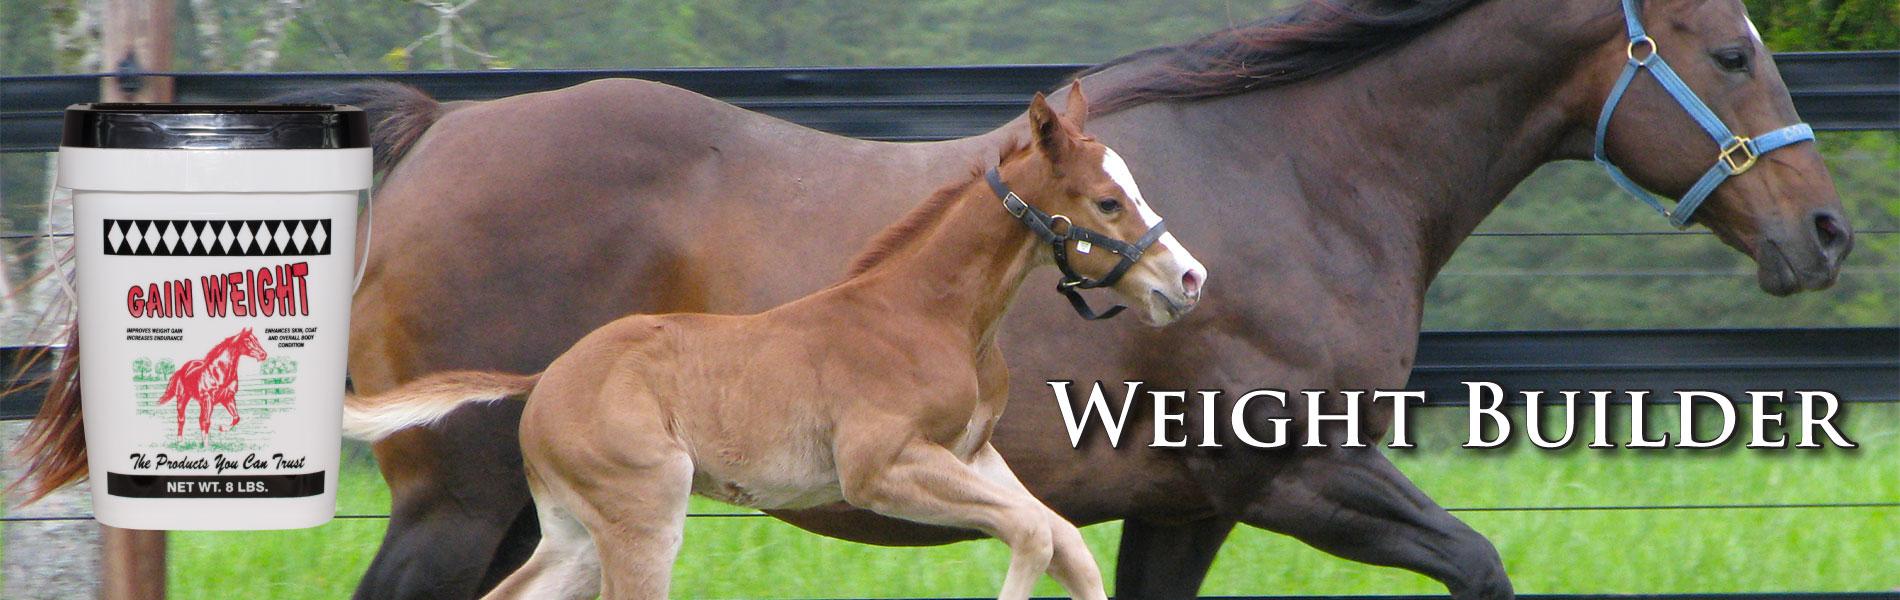 cox-vet-lab-horse-weight-gain